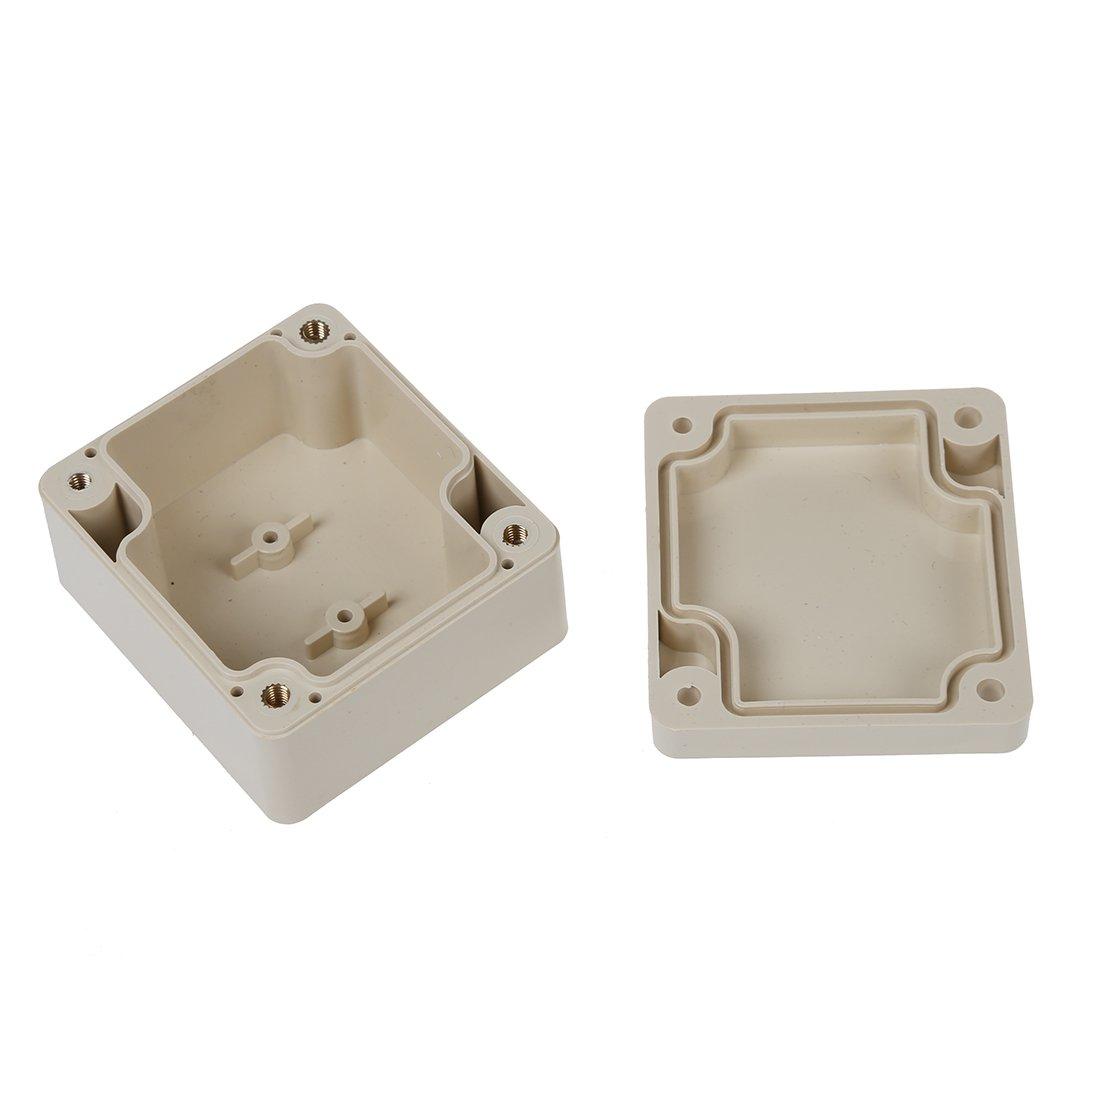 Cikuso 65mm x 58mm x 35mm Waterproof Plastic Enclosure Case DIY Junction Box